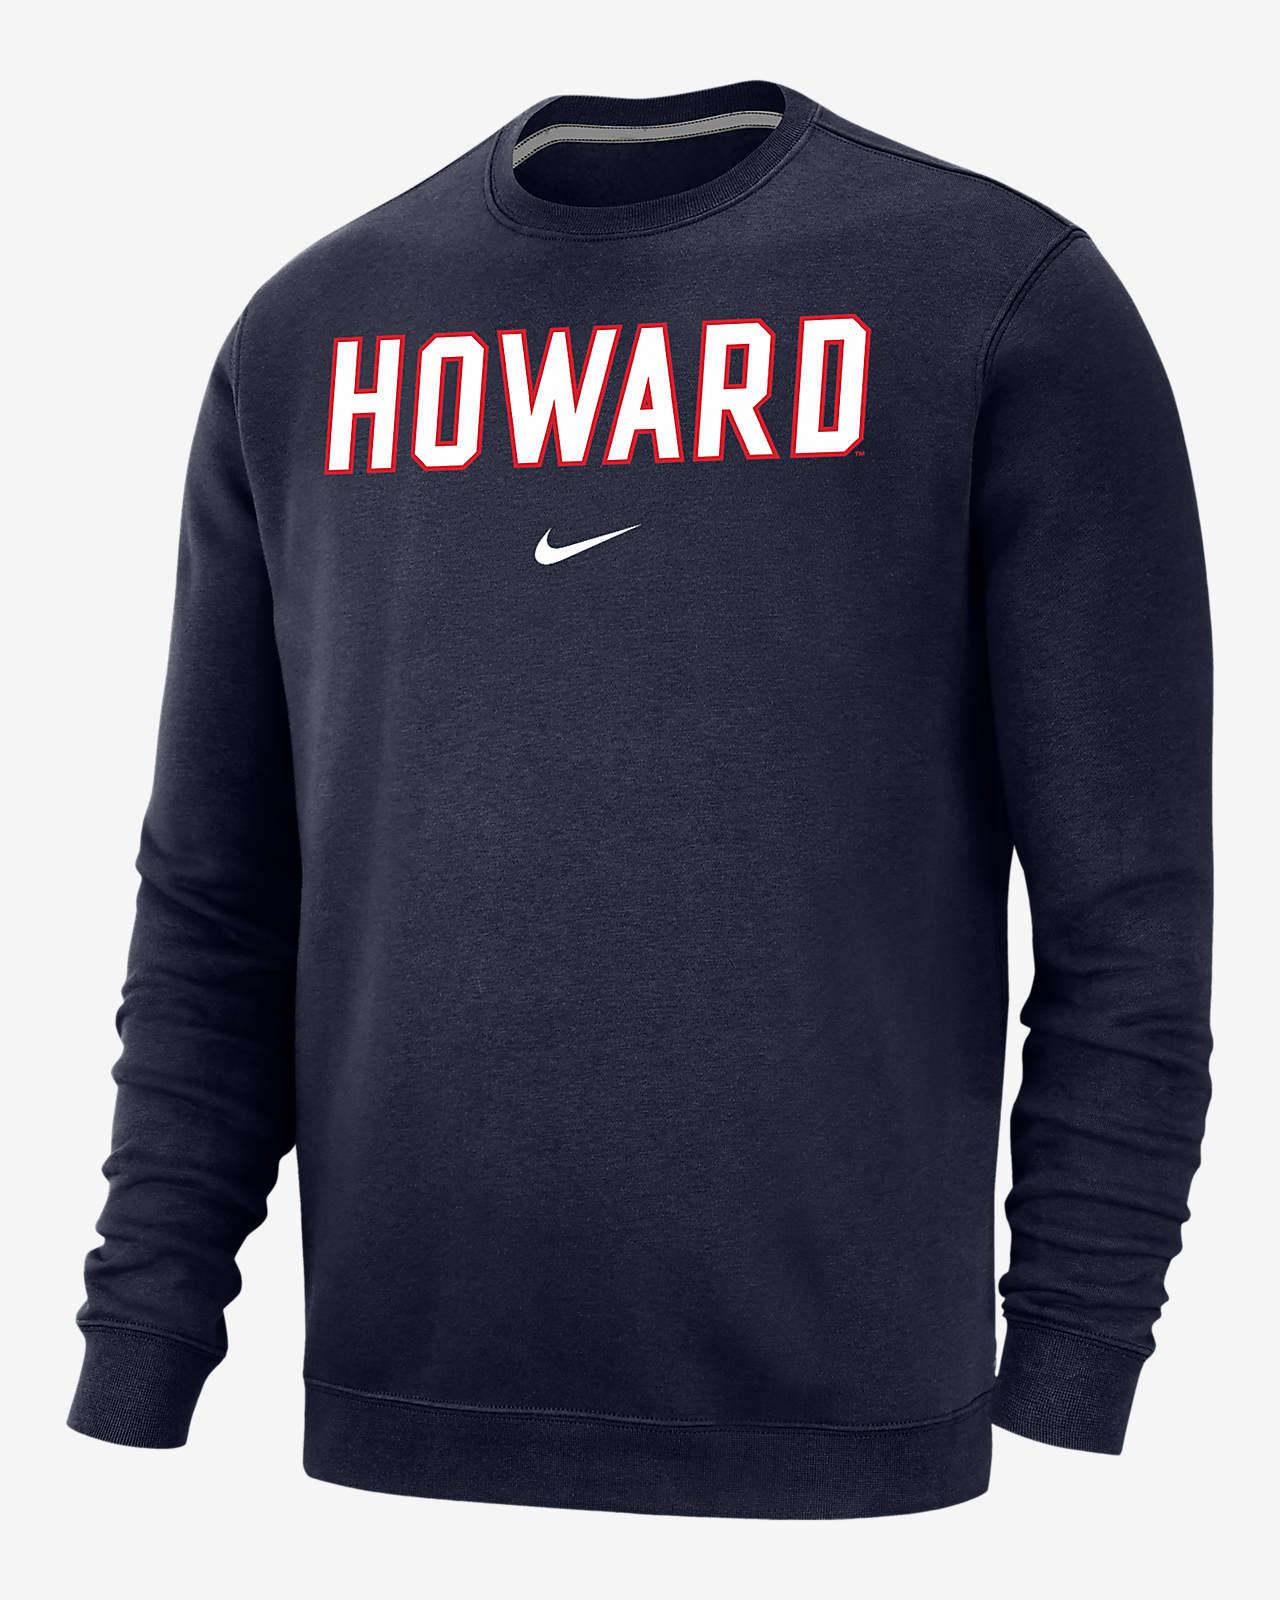 Nike College Club Fleece (Howard) Crew Sweatshirt